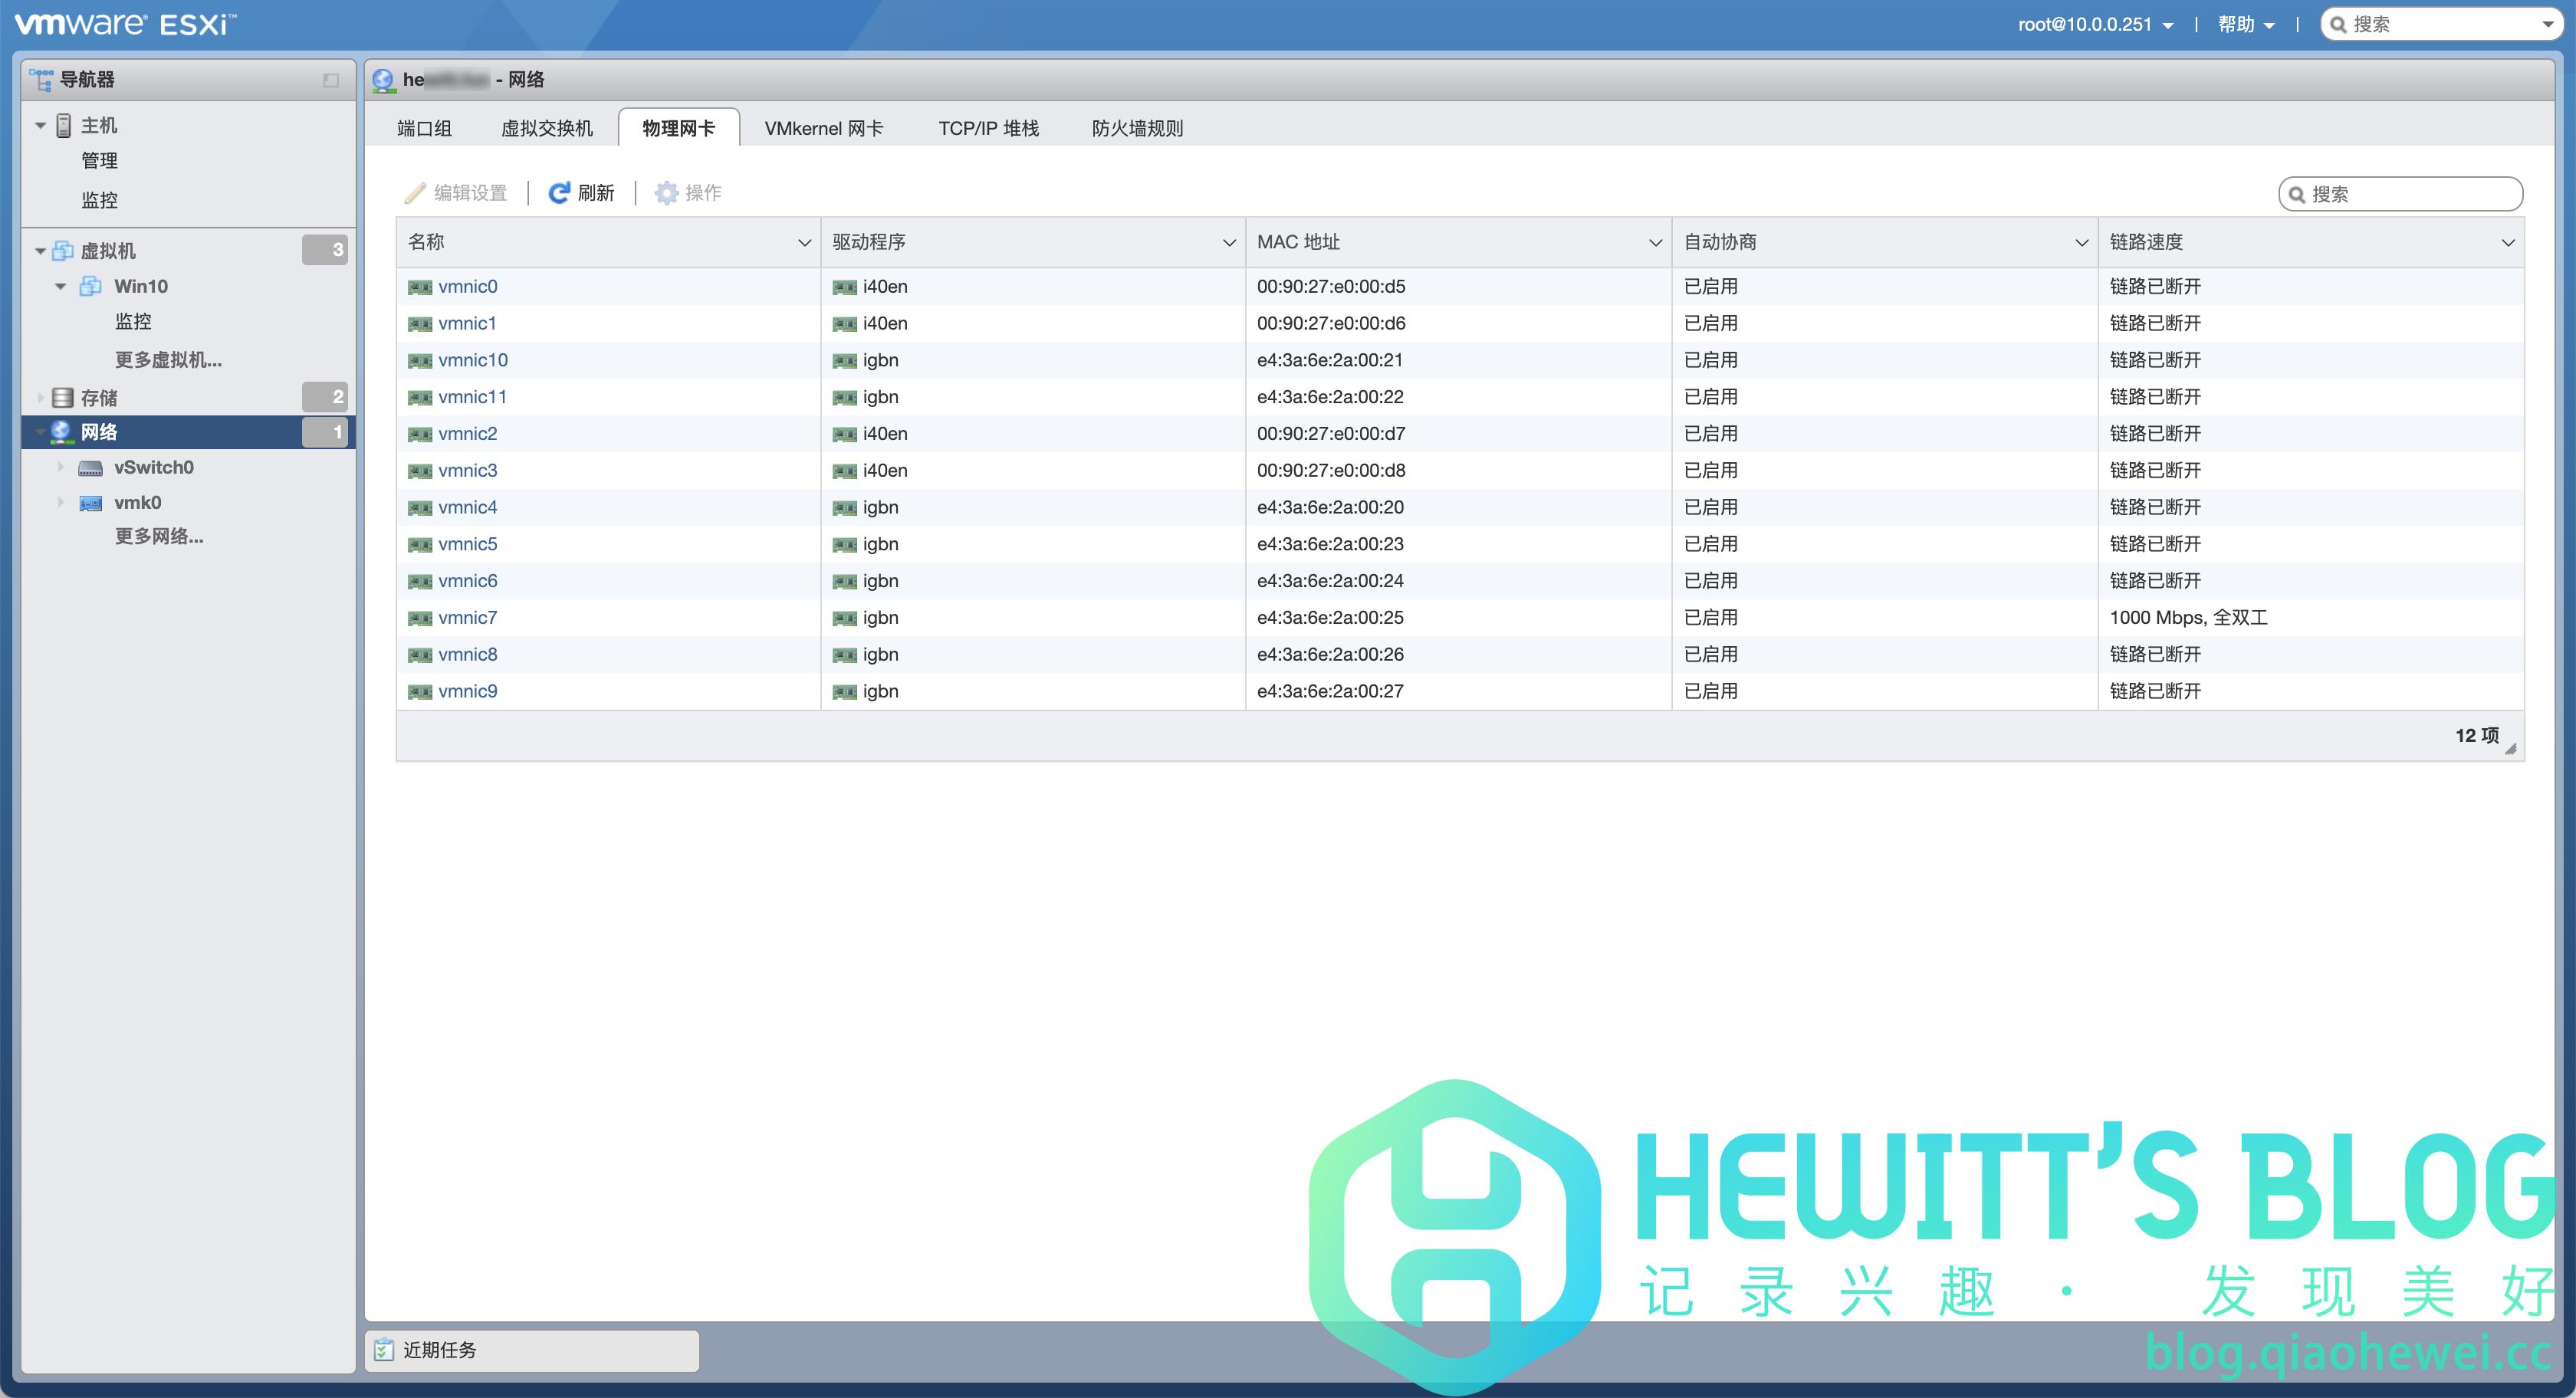 ESXI安装Mikrotik RouterOS(ROS)软路由部署指南(附授权镜像下载)插图1